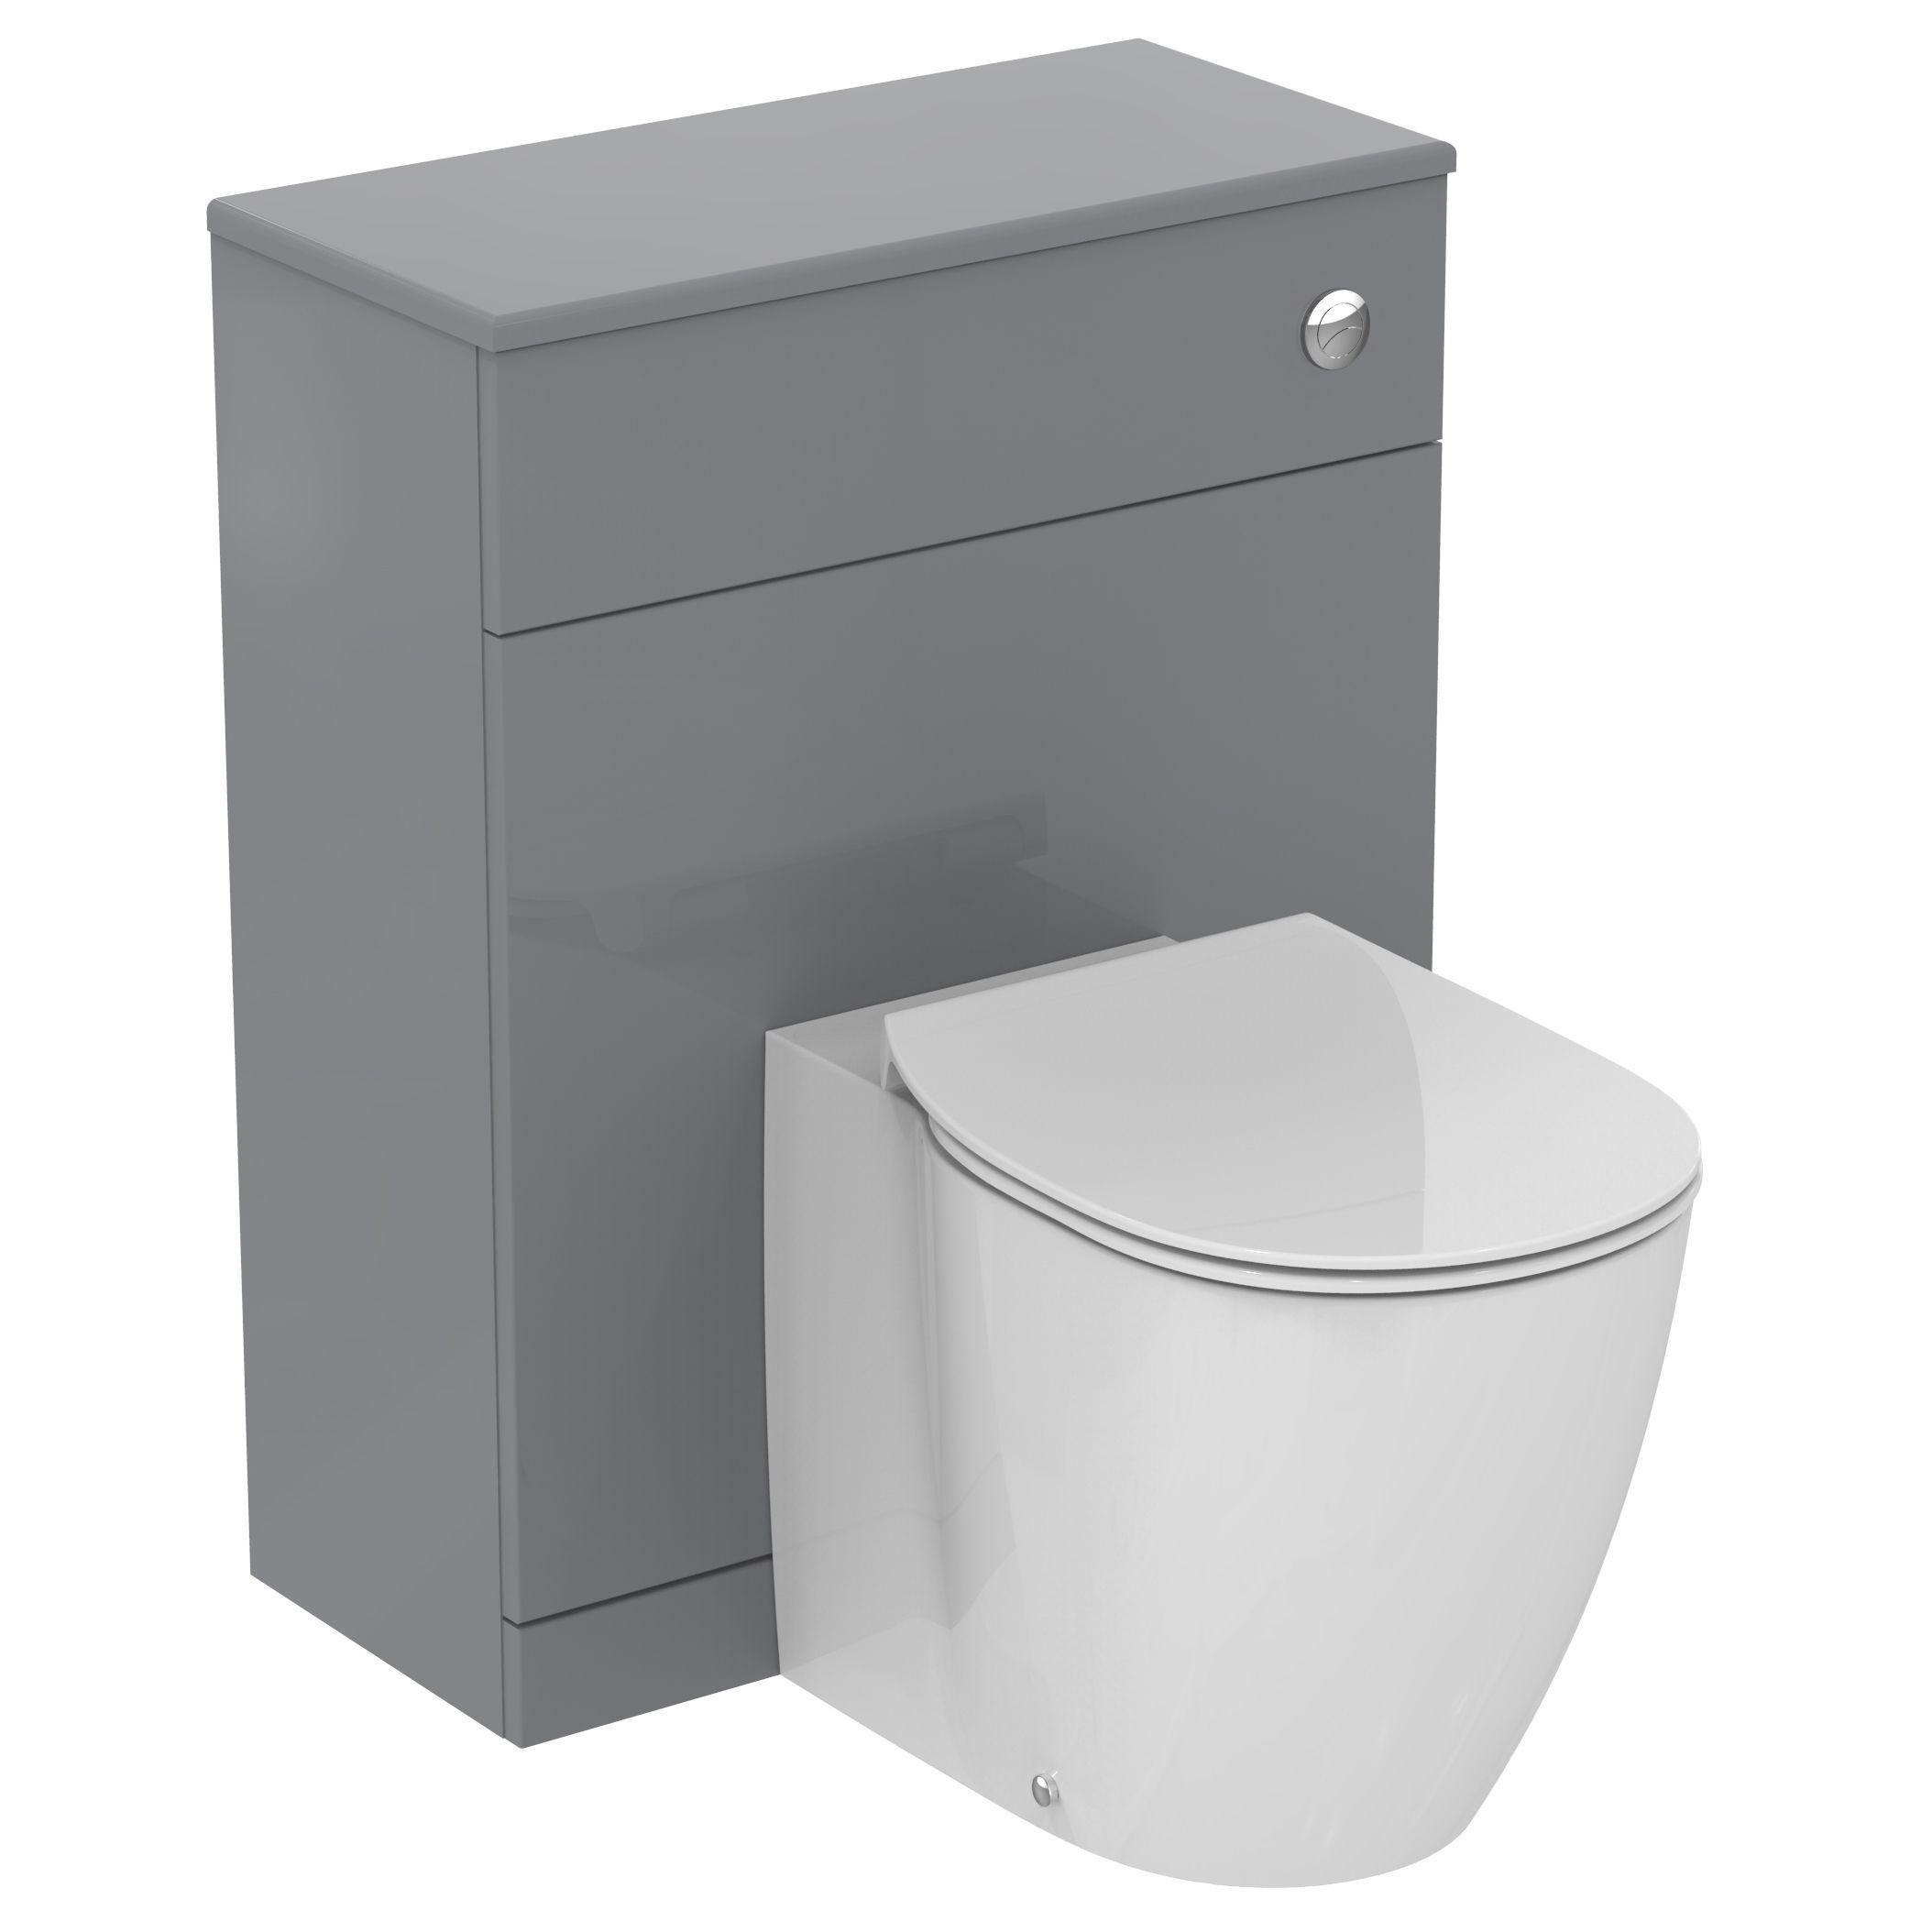 ideal standard imagine aquablade back to wall toilet unit wc set with soft close seat. Black Bedroom Furniture Sets. Home Design Ideas